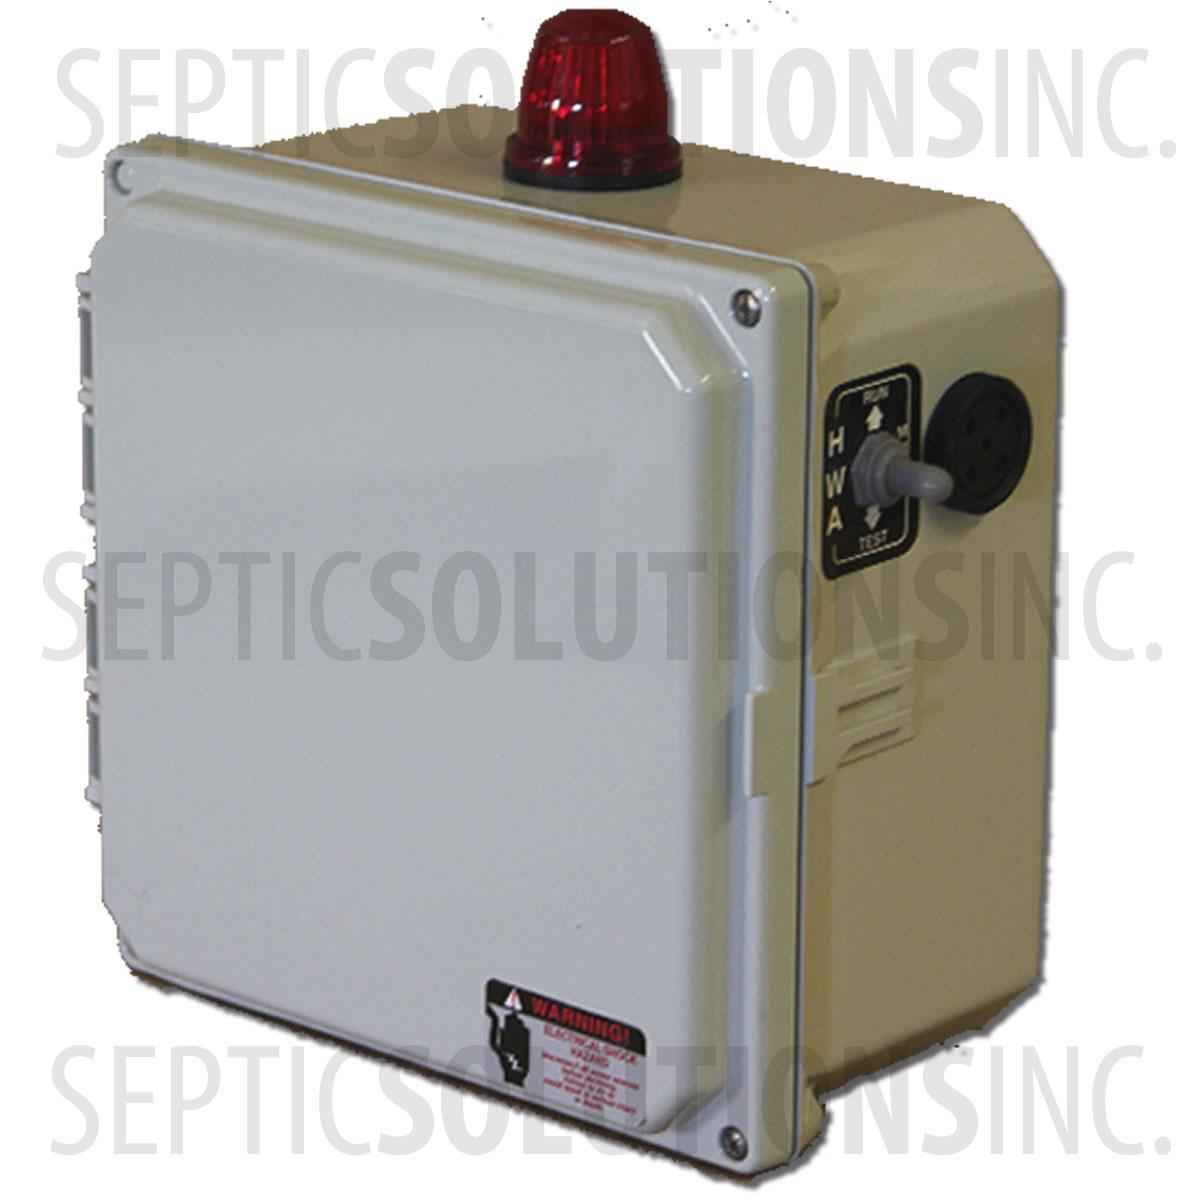 Bio C Aerobic Septic System Control Panel Fast Amp Free